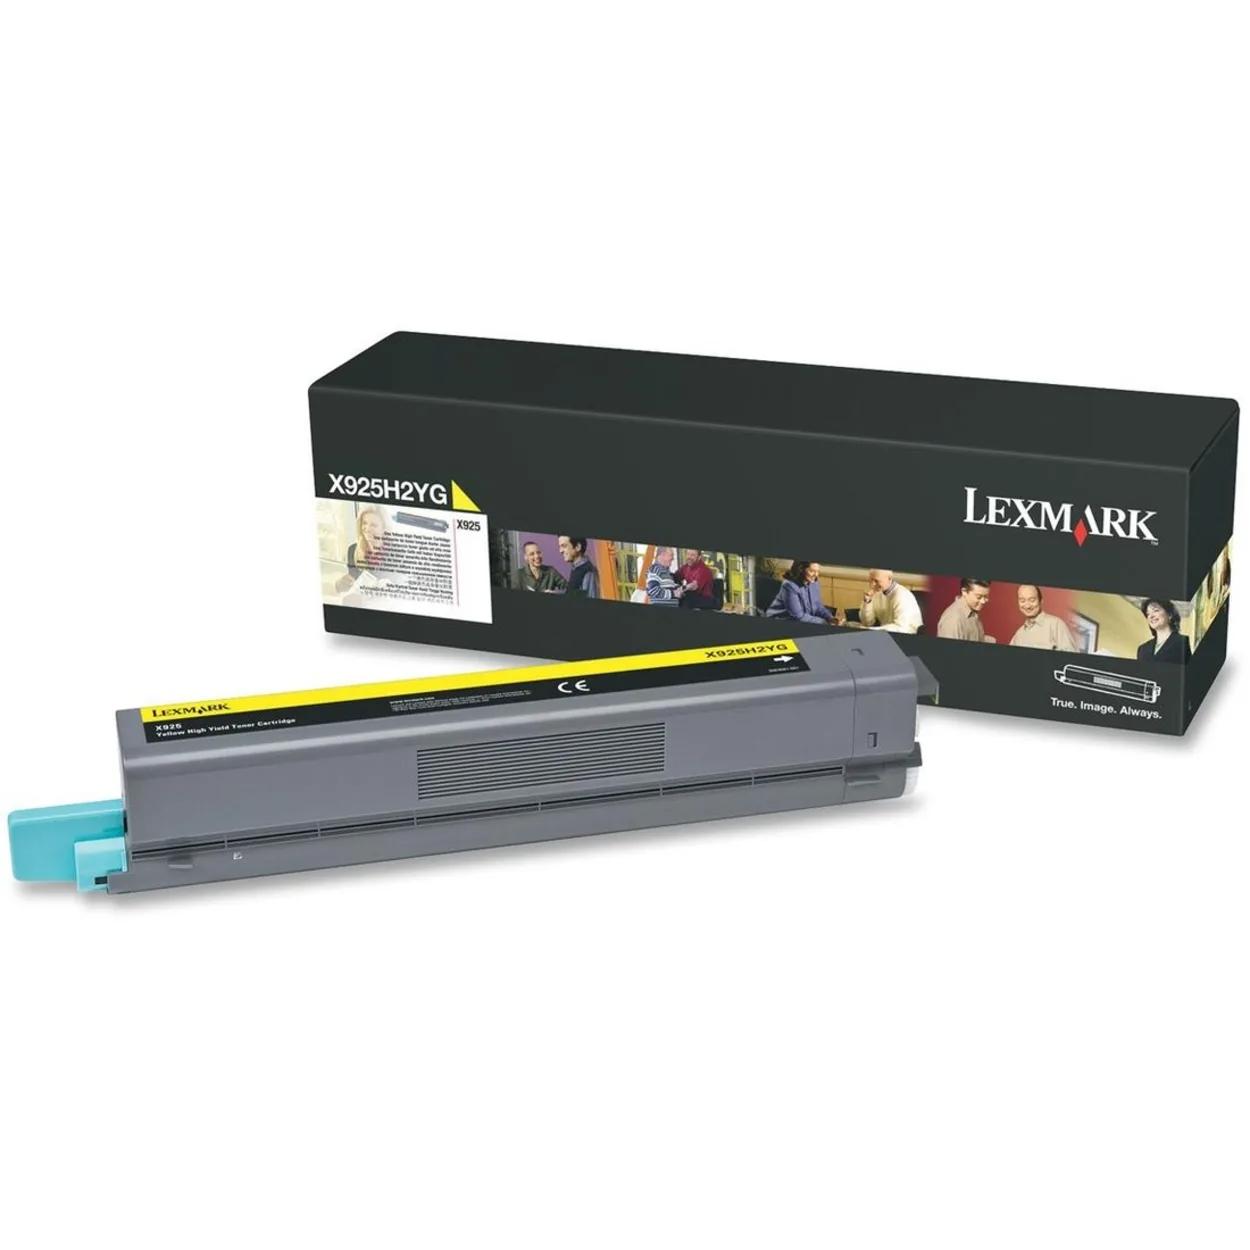 Original Lexmark X925 High-Yield Laser Toner Cartridge  Yellow